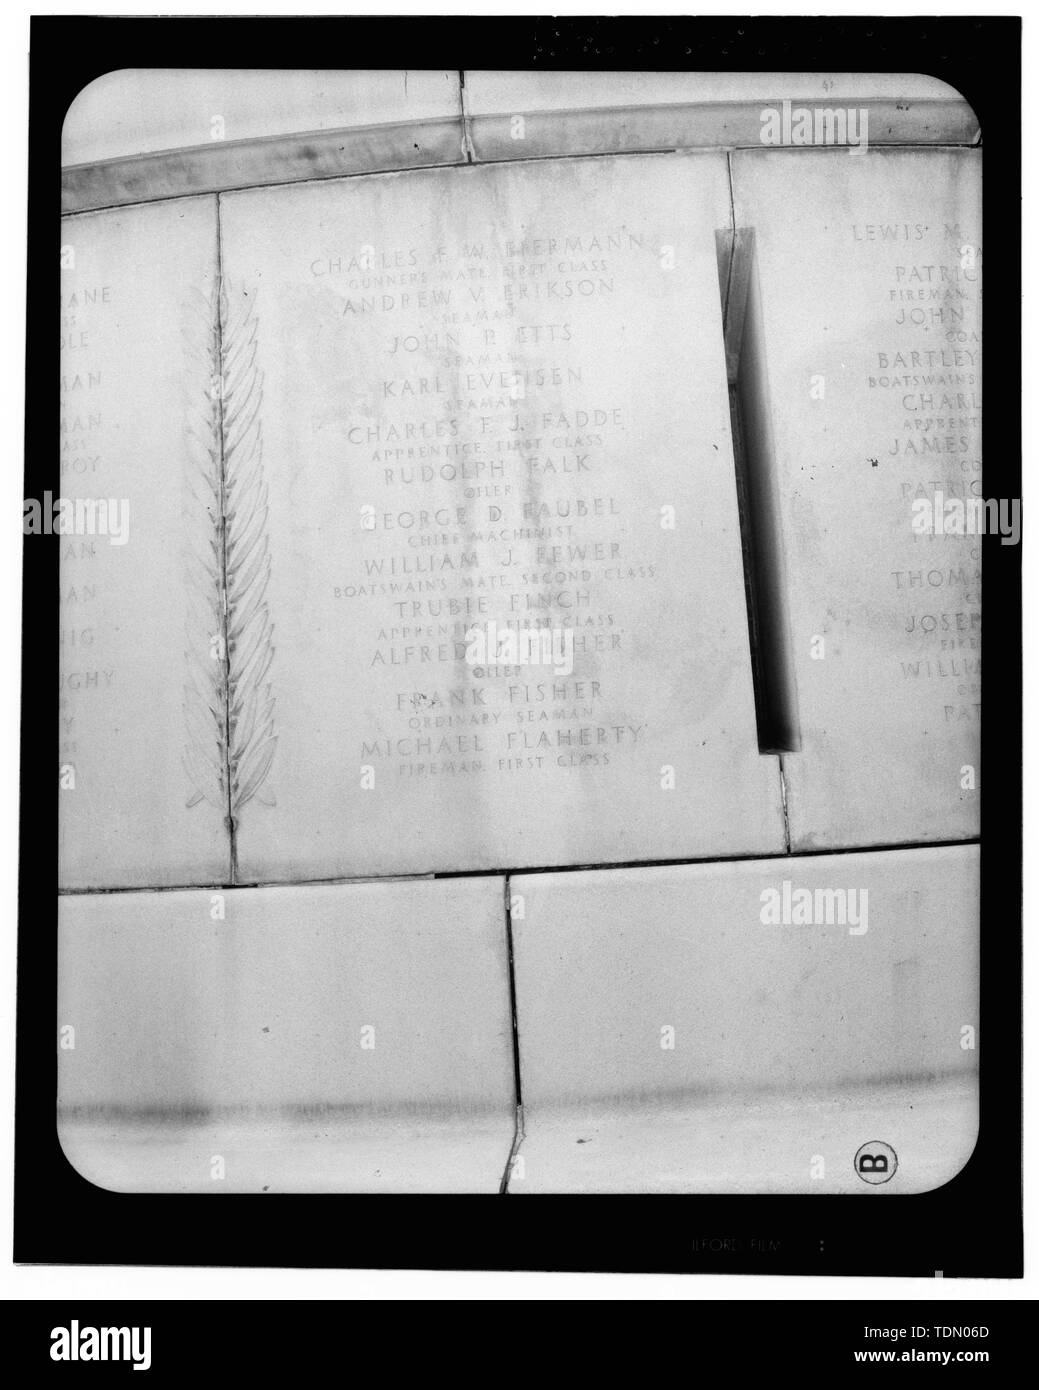 Panel 5 - Arlington National Cemetery, USS Maine Memorial, Arlington, Arlington County, VA; U.S. Army Corps of Engineers; Wyeth, Nathan C; Black, William M; Patrick, Mason M; Ferguson, H B; Bixby, W H; Goodson, W F; Lackawanna Steel Company; T.L. Huston Construction Company; Harris Brothers; Clark, D Lombillo; Primelles, Arturo; Rhodes, D H; Jenkins, Oliver B; Tilford, James D; Aleshire, J B; Stimson, H E; Scofield, John J; Hugh, R P; Houston, J B; Sharpe, Henry G; Downey, G F; Clem, L; Cosby, Spencer; Taft, William Howard; Commission of Fine Arts; Olmsted, Fredrick Law; French, Daniel Chester - Stock Image